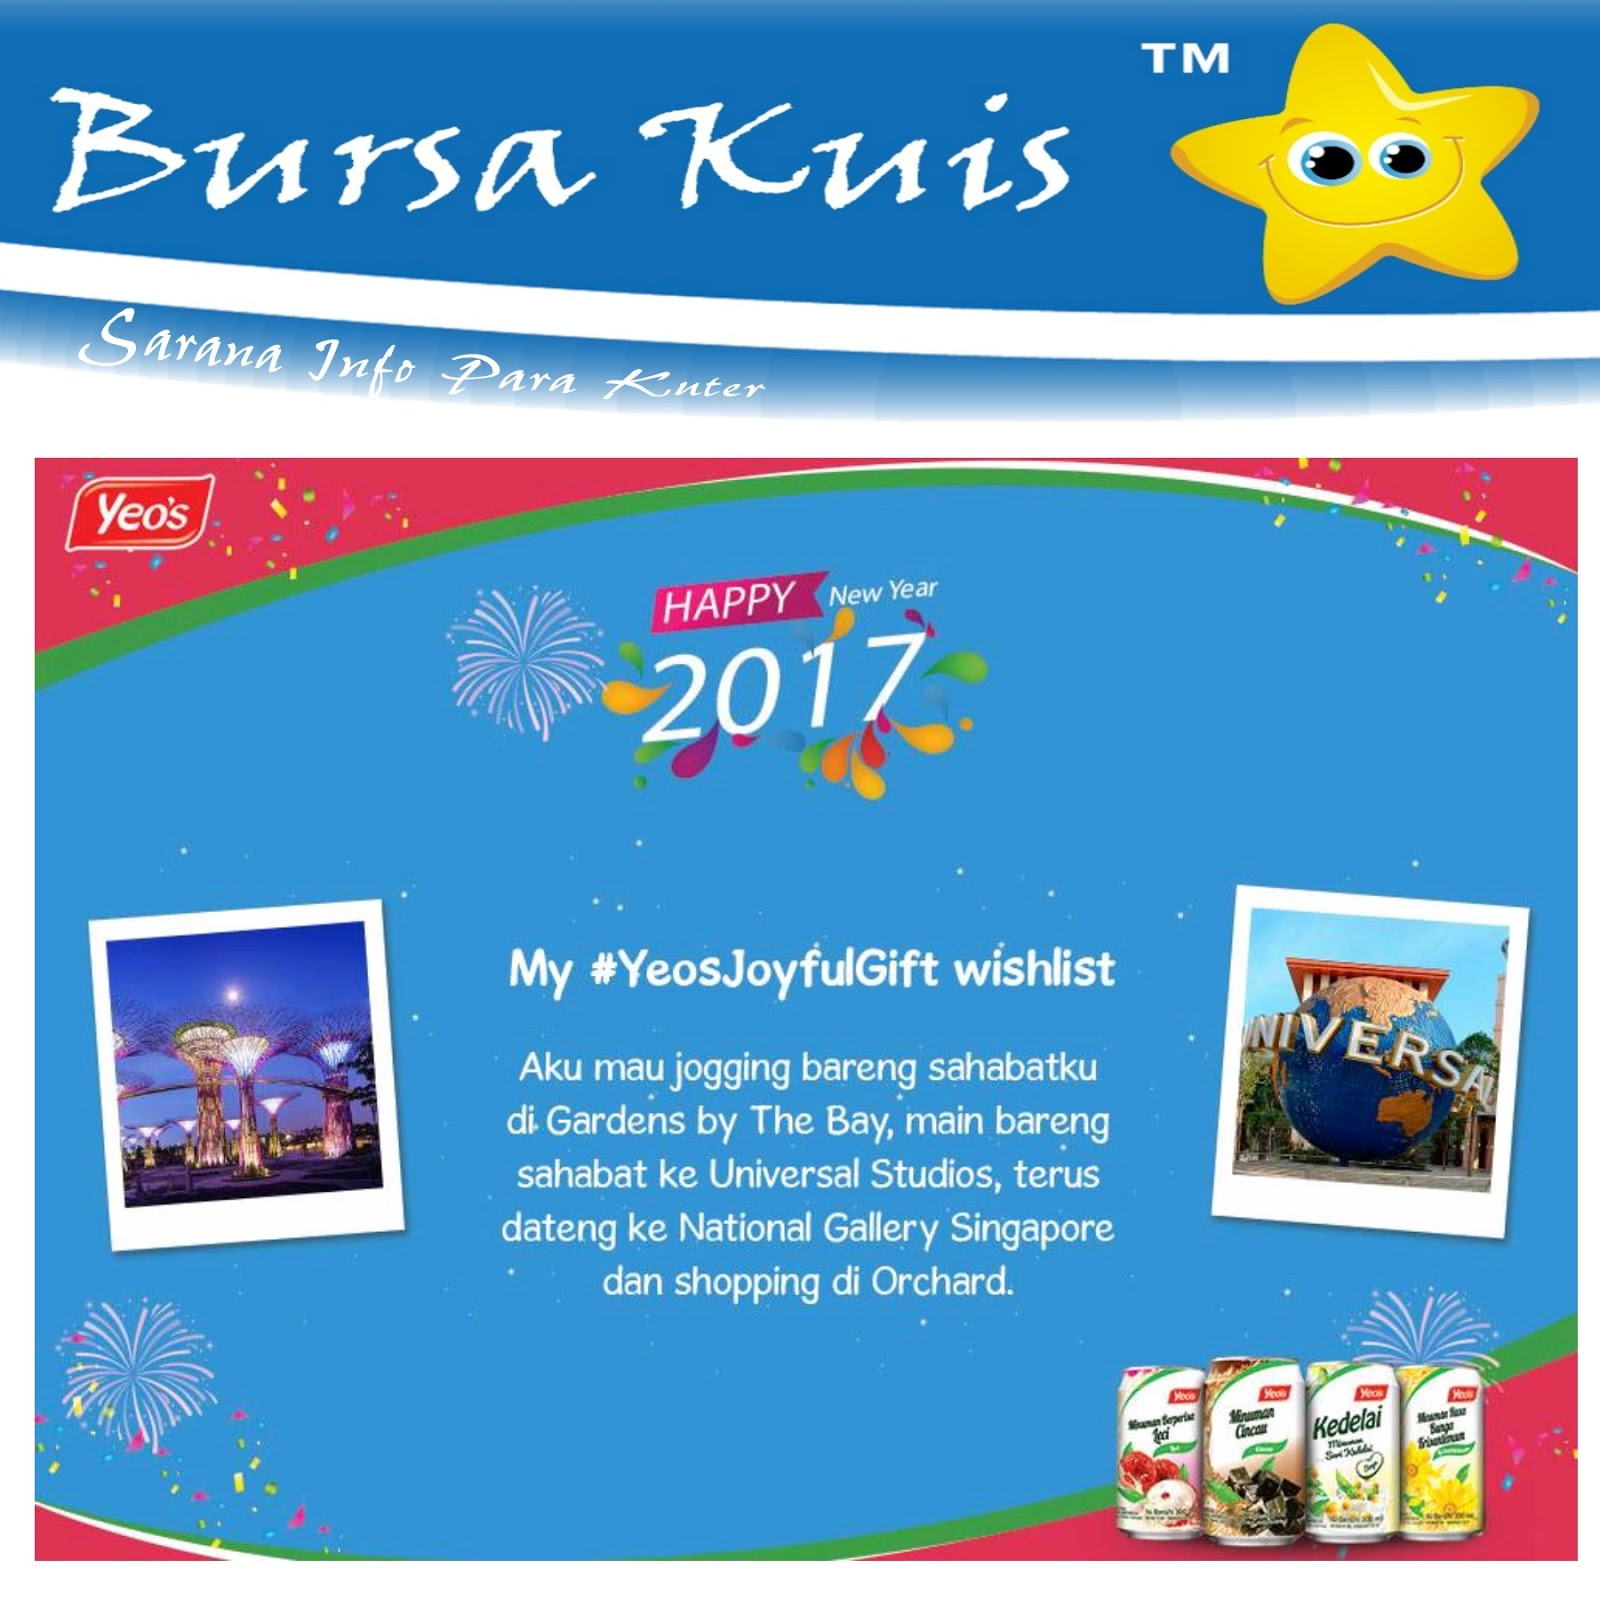 Kuis Yeos Joy Ful Gift Competition Berhadiah Liburan